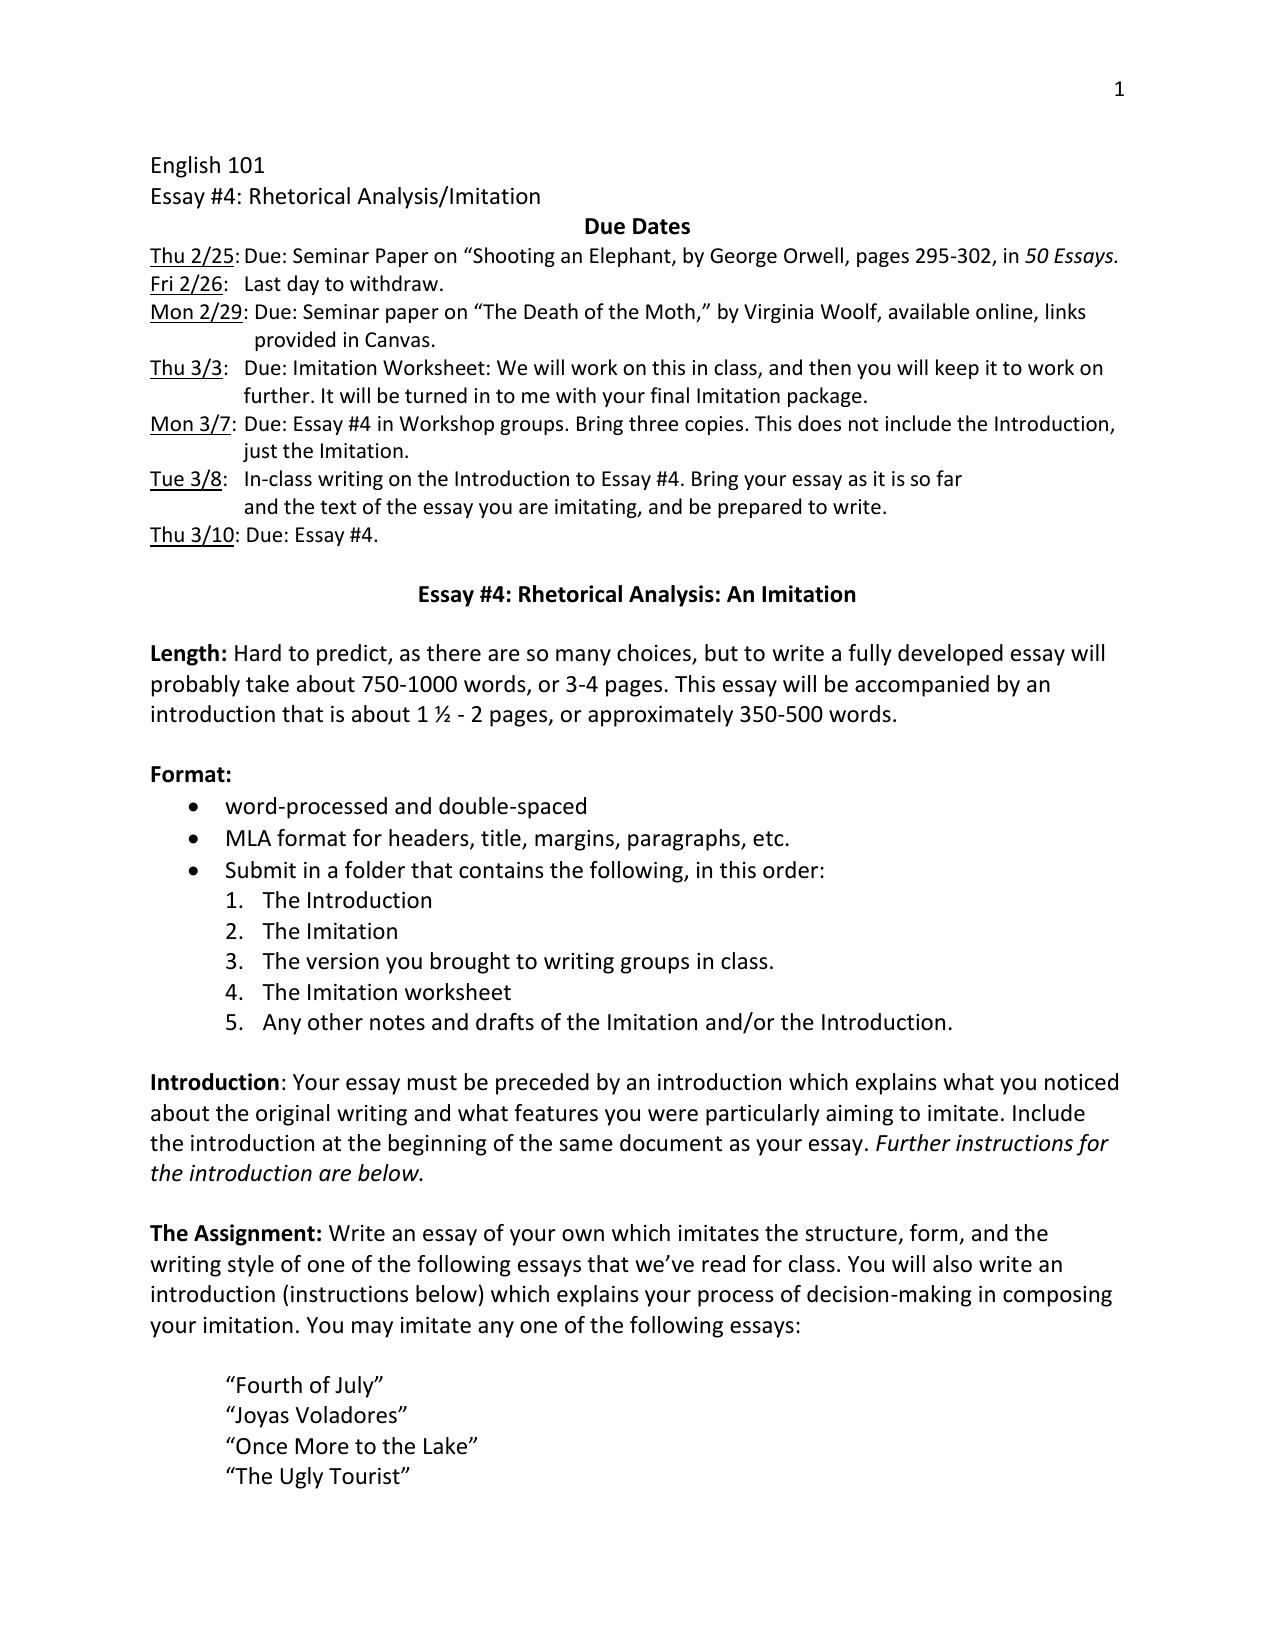 English  Essay  Rhetorical Analysisimitation Due Dates Business Essay Example Health Is Wealth Essay English  Essay  Rhetorical Analysisimitation Due Dates Sample Of English Essay also Research Paper Essays